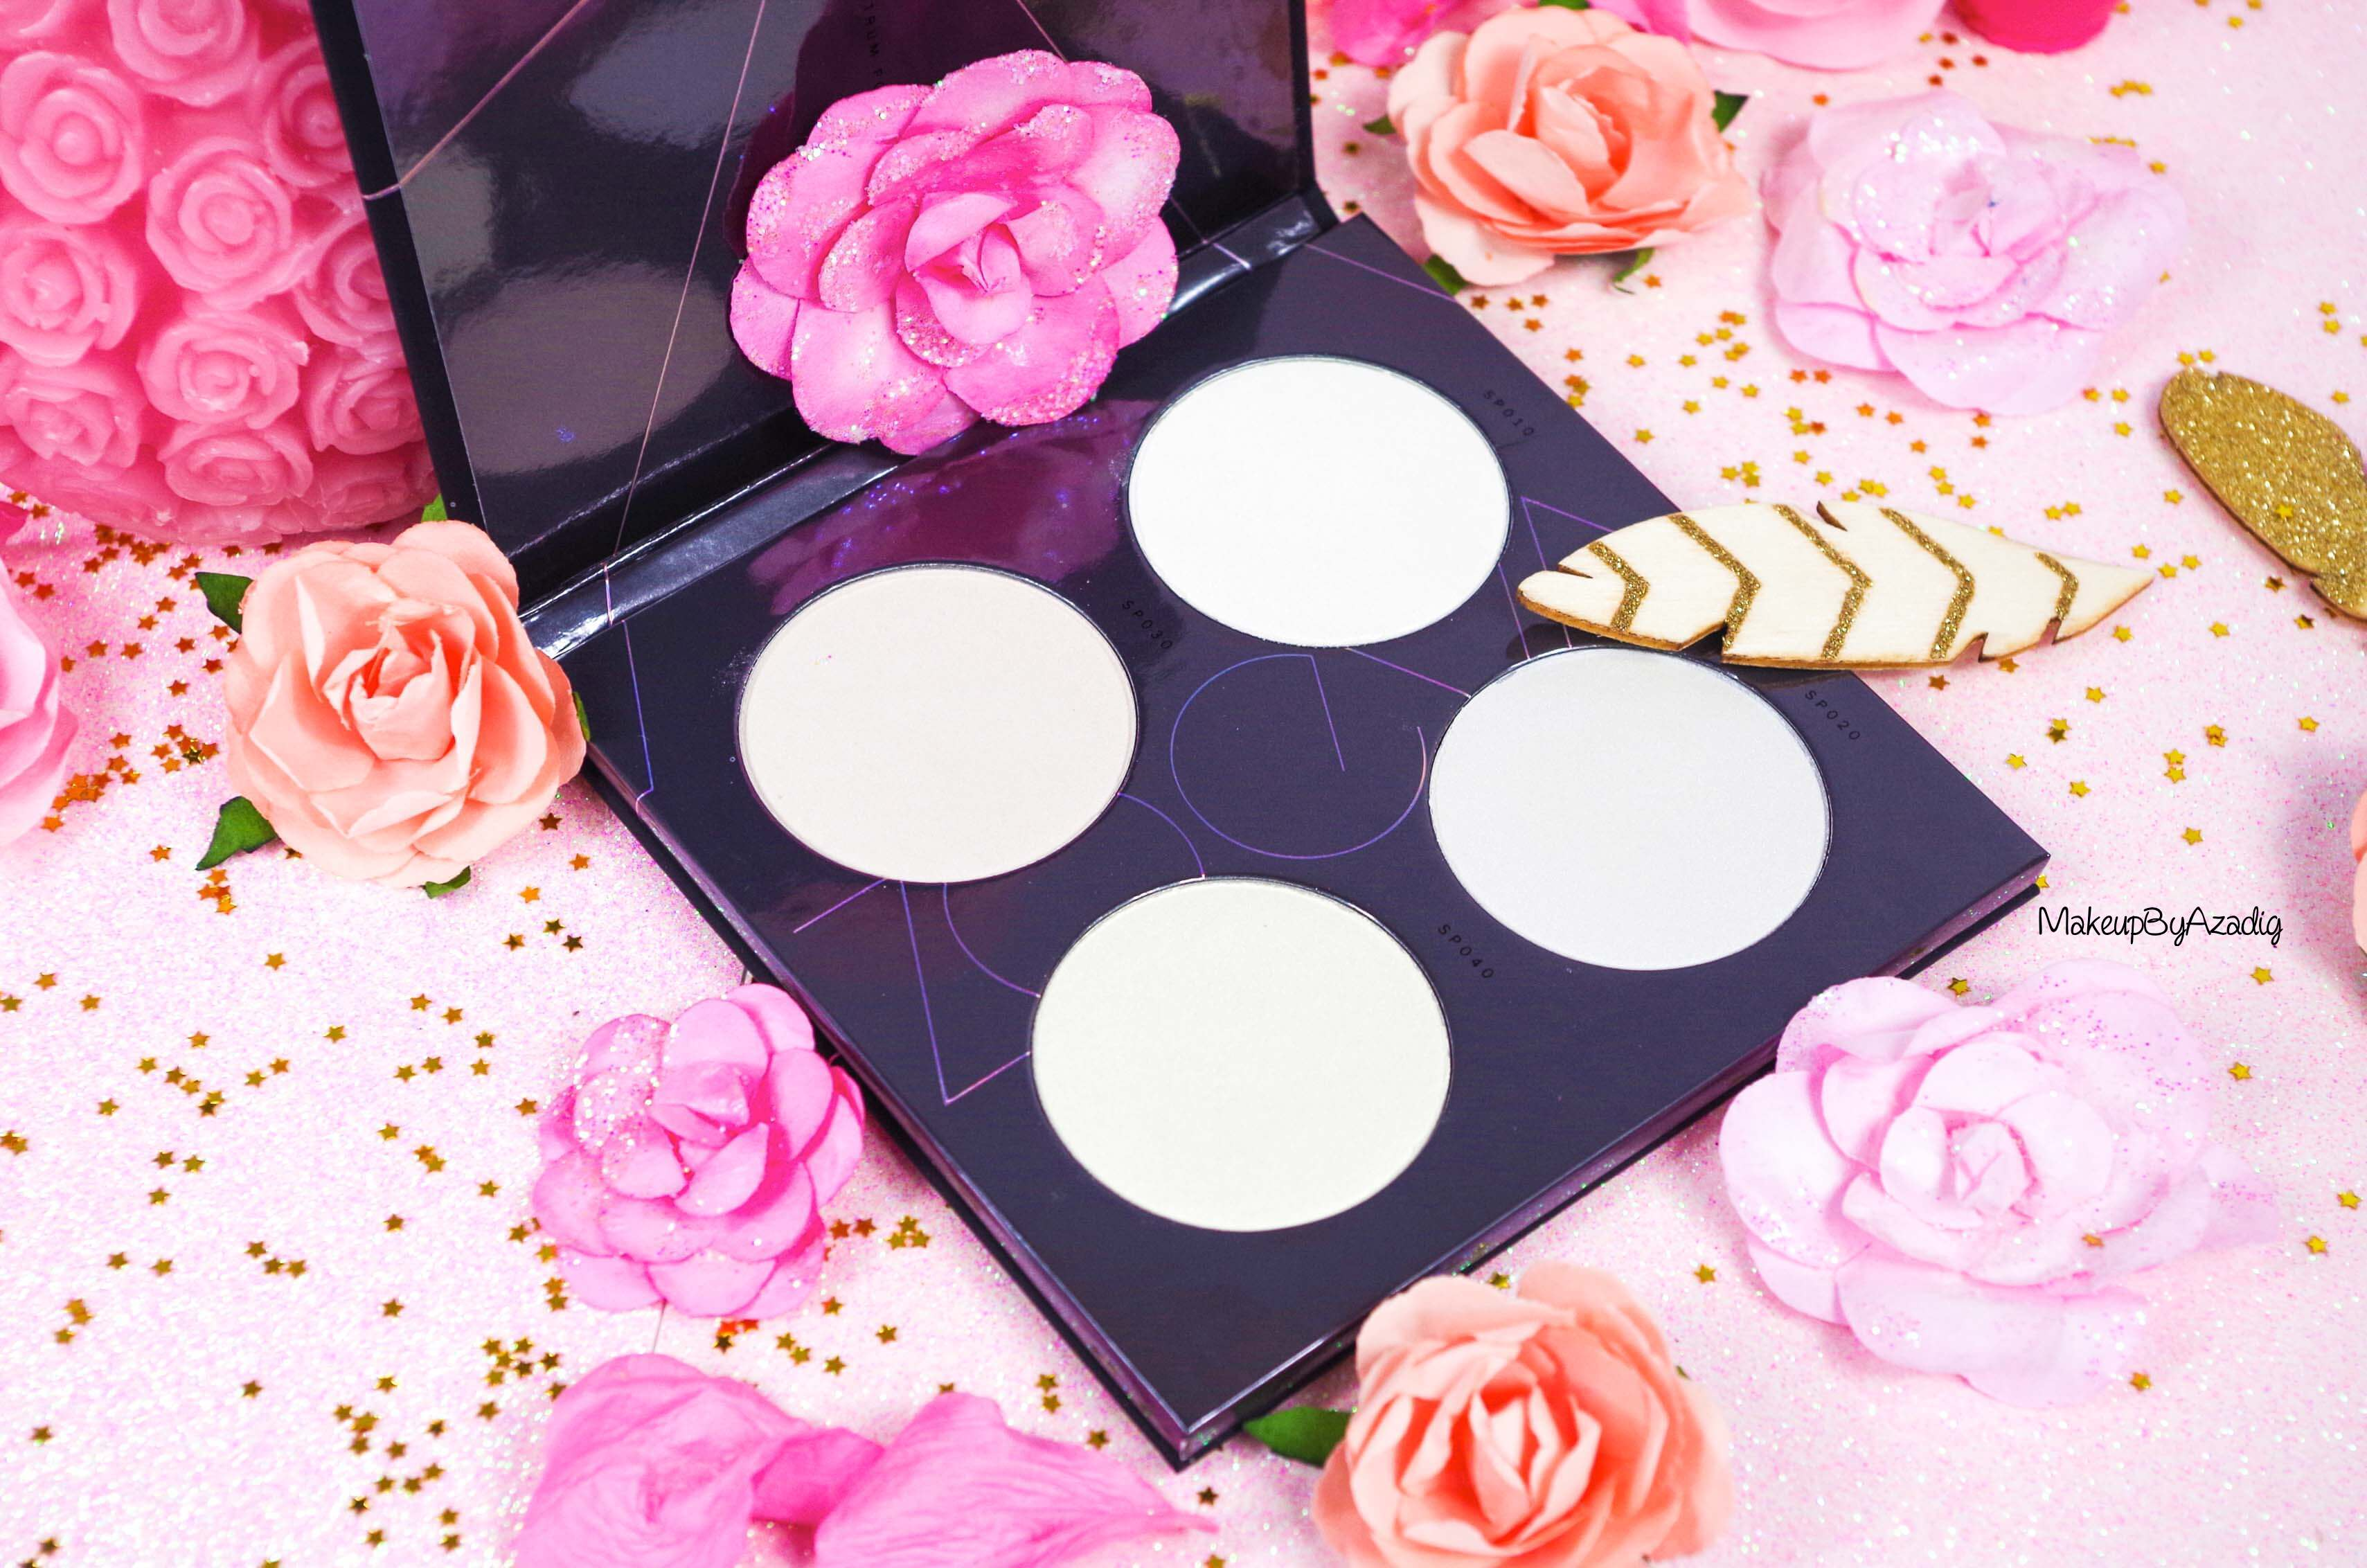 palette-highlighter-enlumineur-pas-cher-spring-strobe-spectrum-zoeva-sephora-arcenciel-licorne-makeupbyazadig-revue-avis-prix-pink